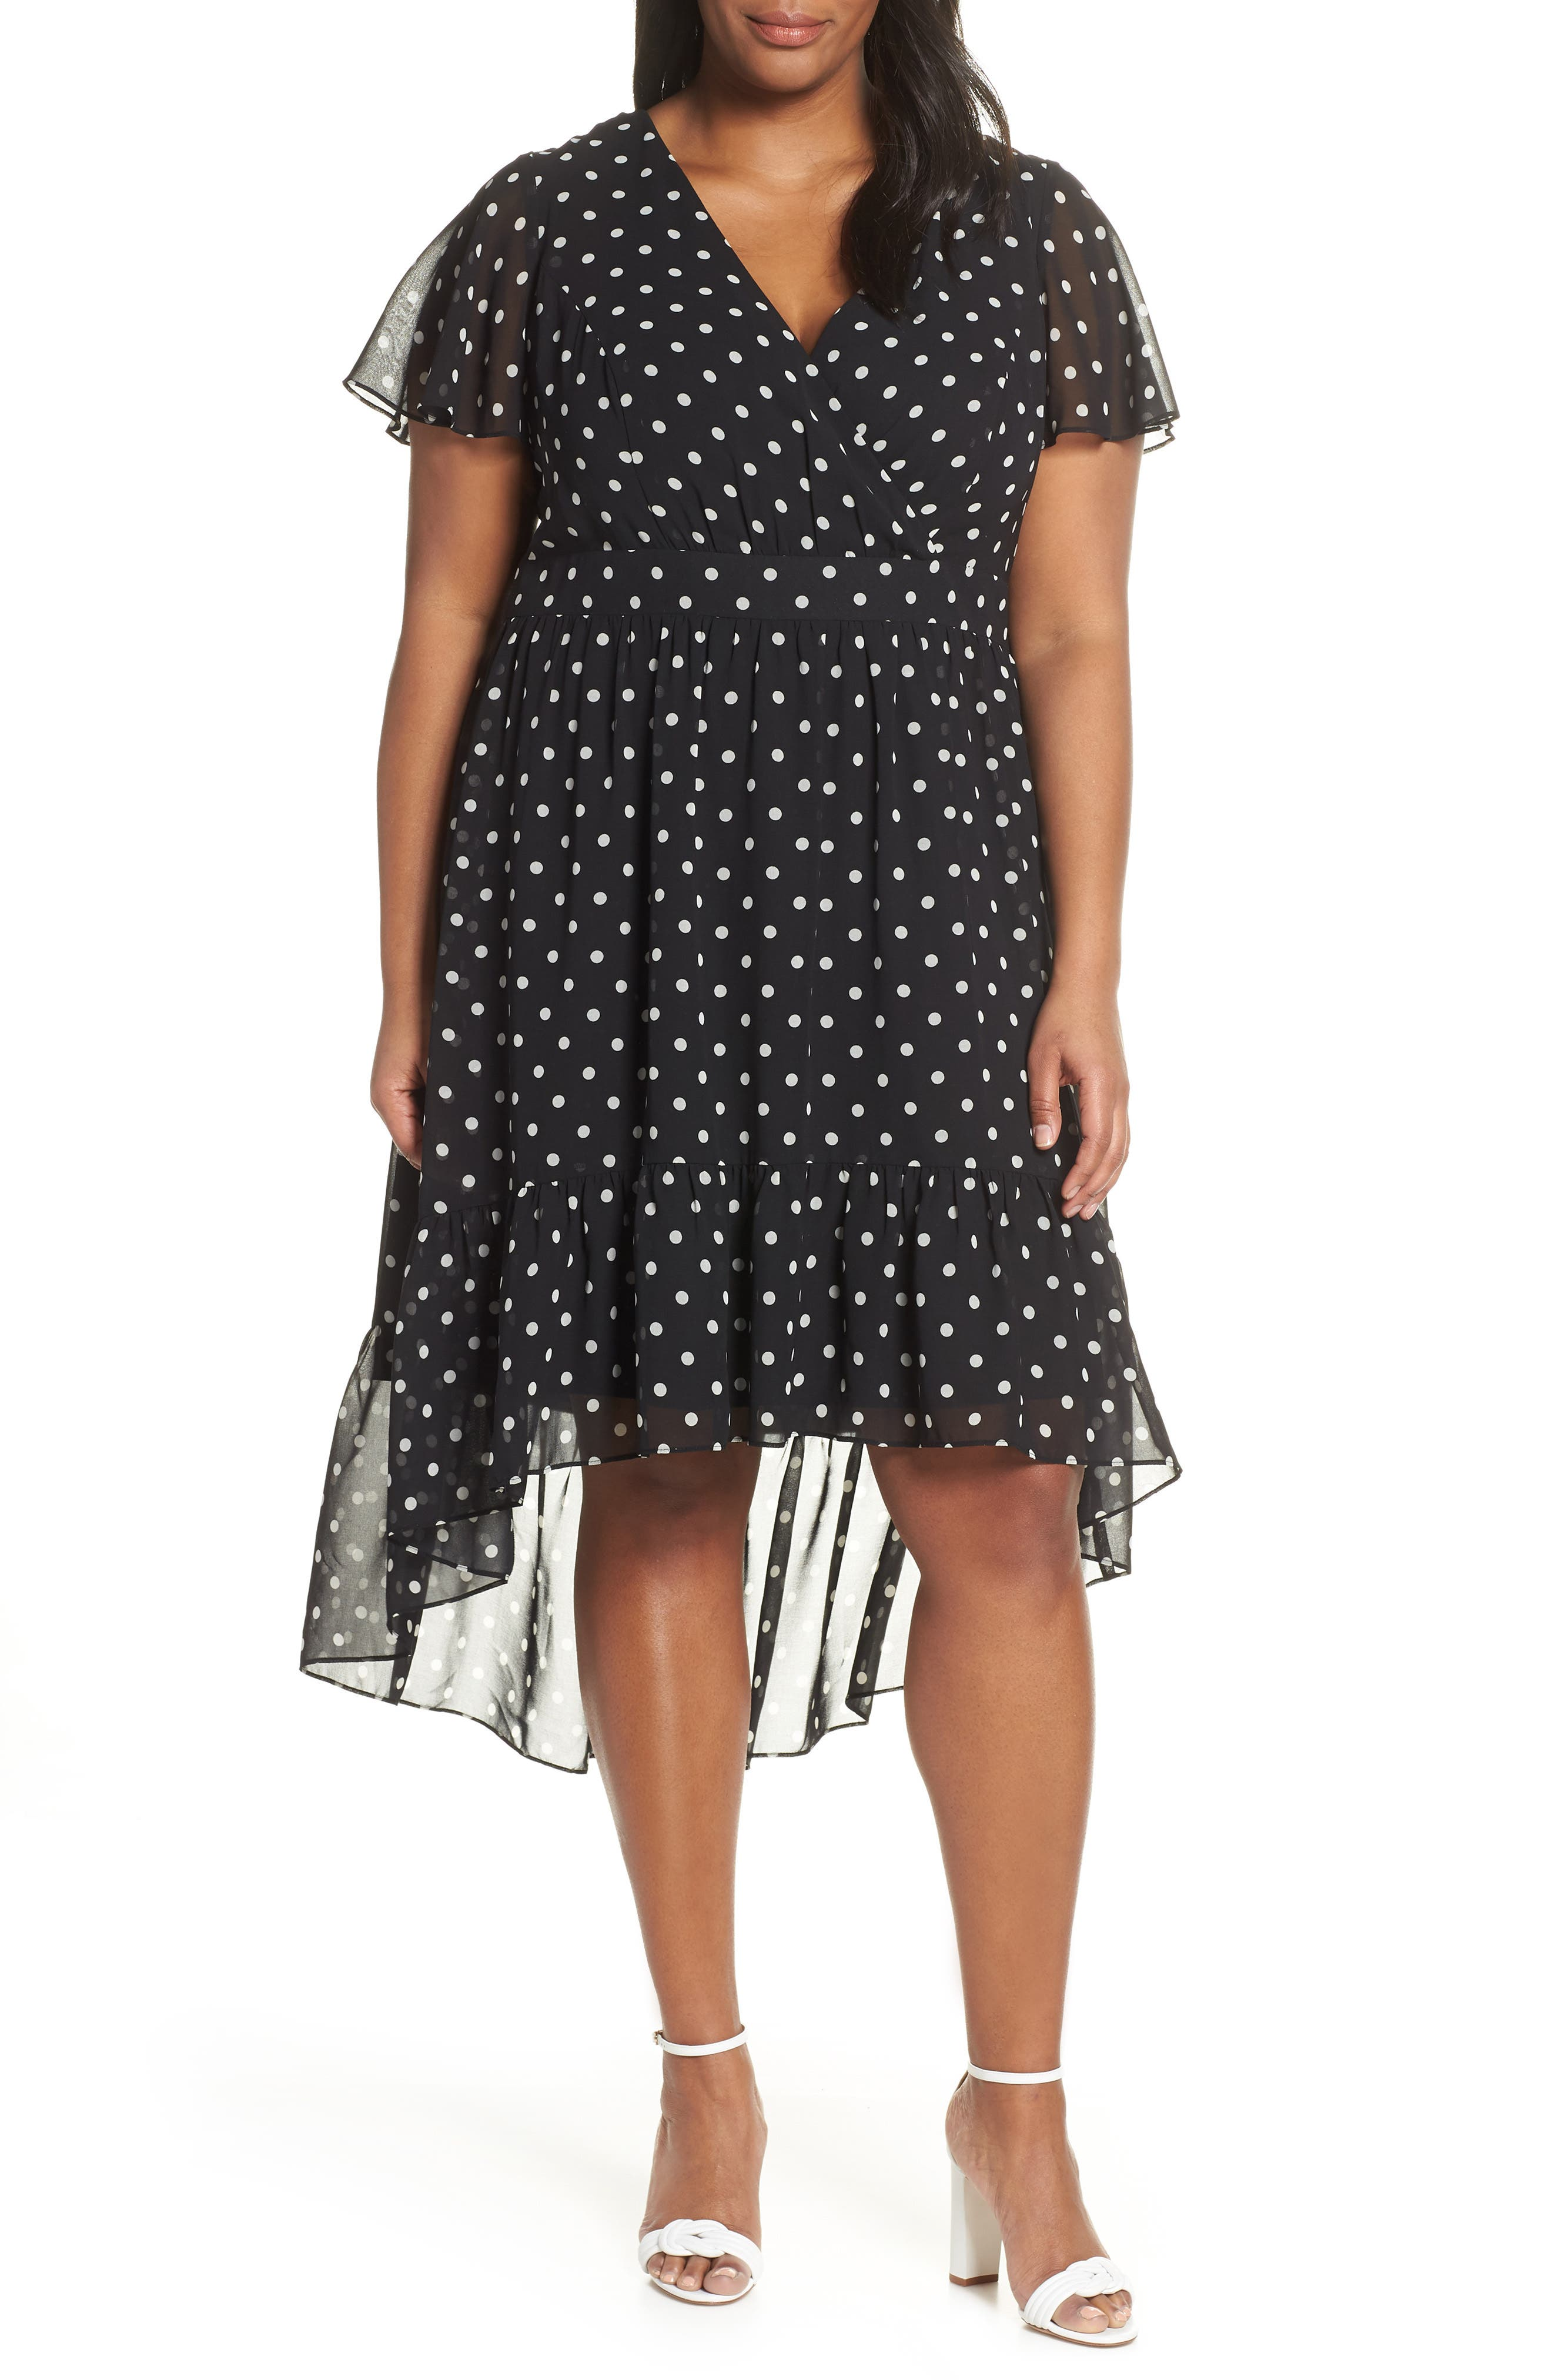 Plus Size Vince Camuto Print High/low Chiffon Dress, Black